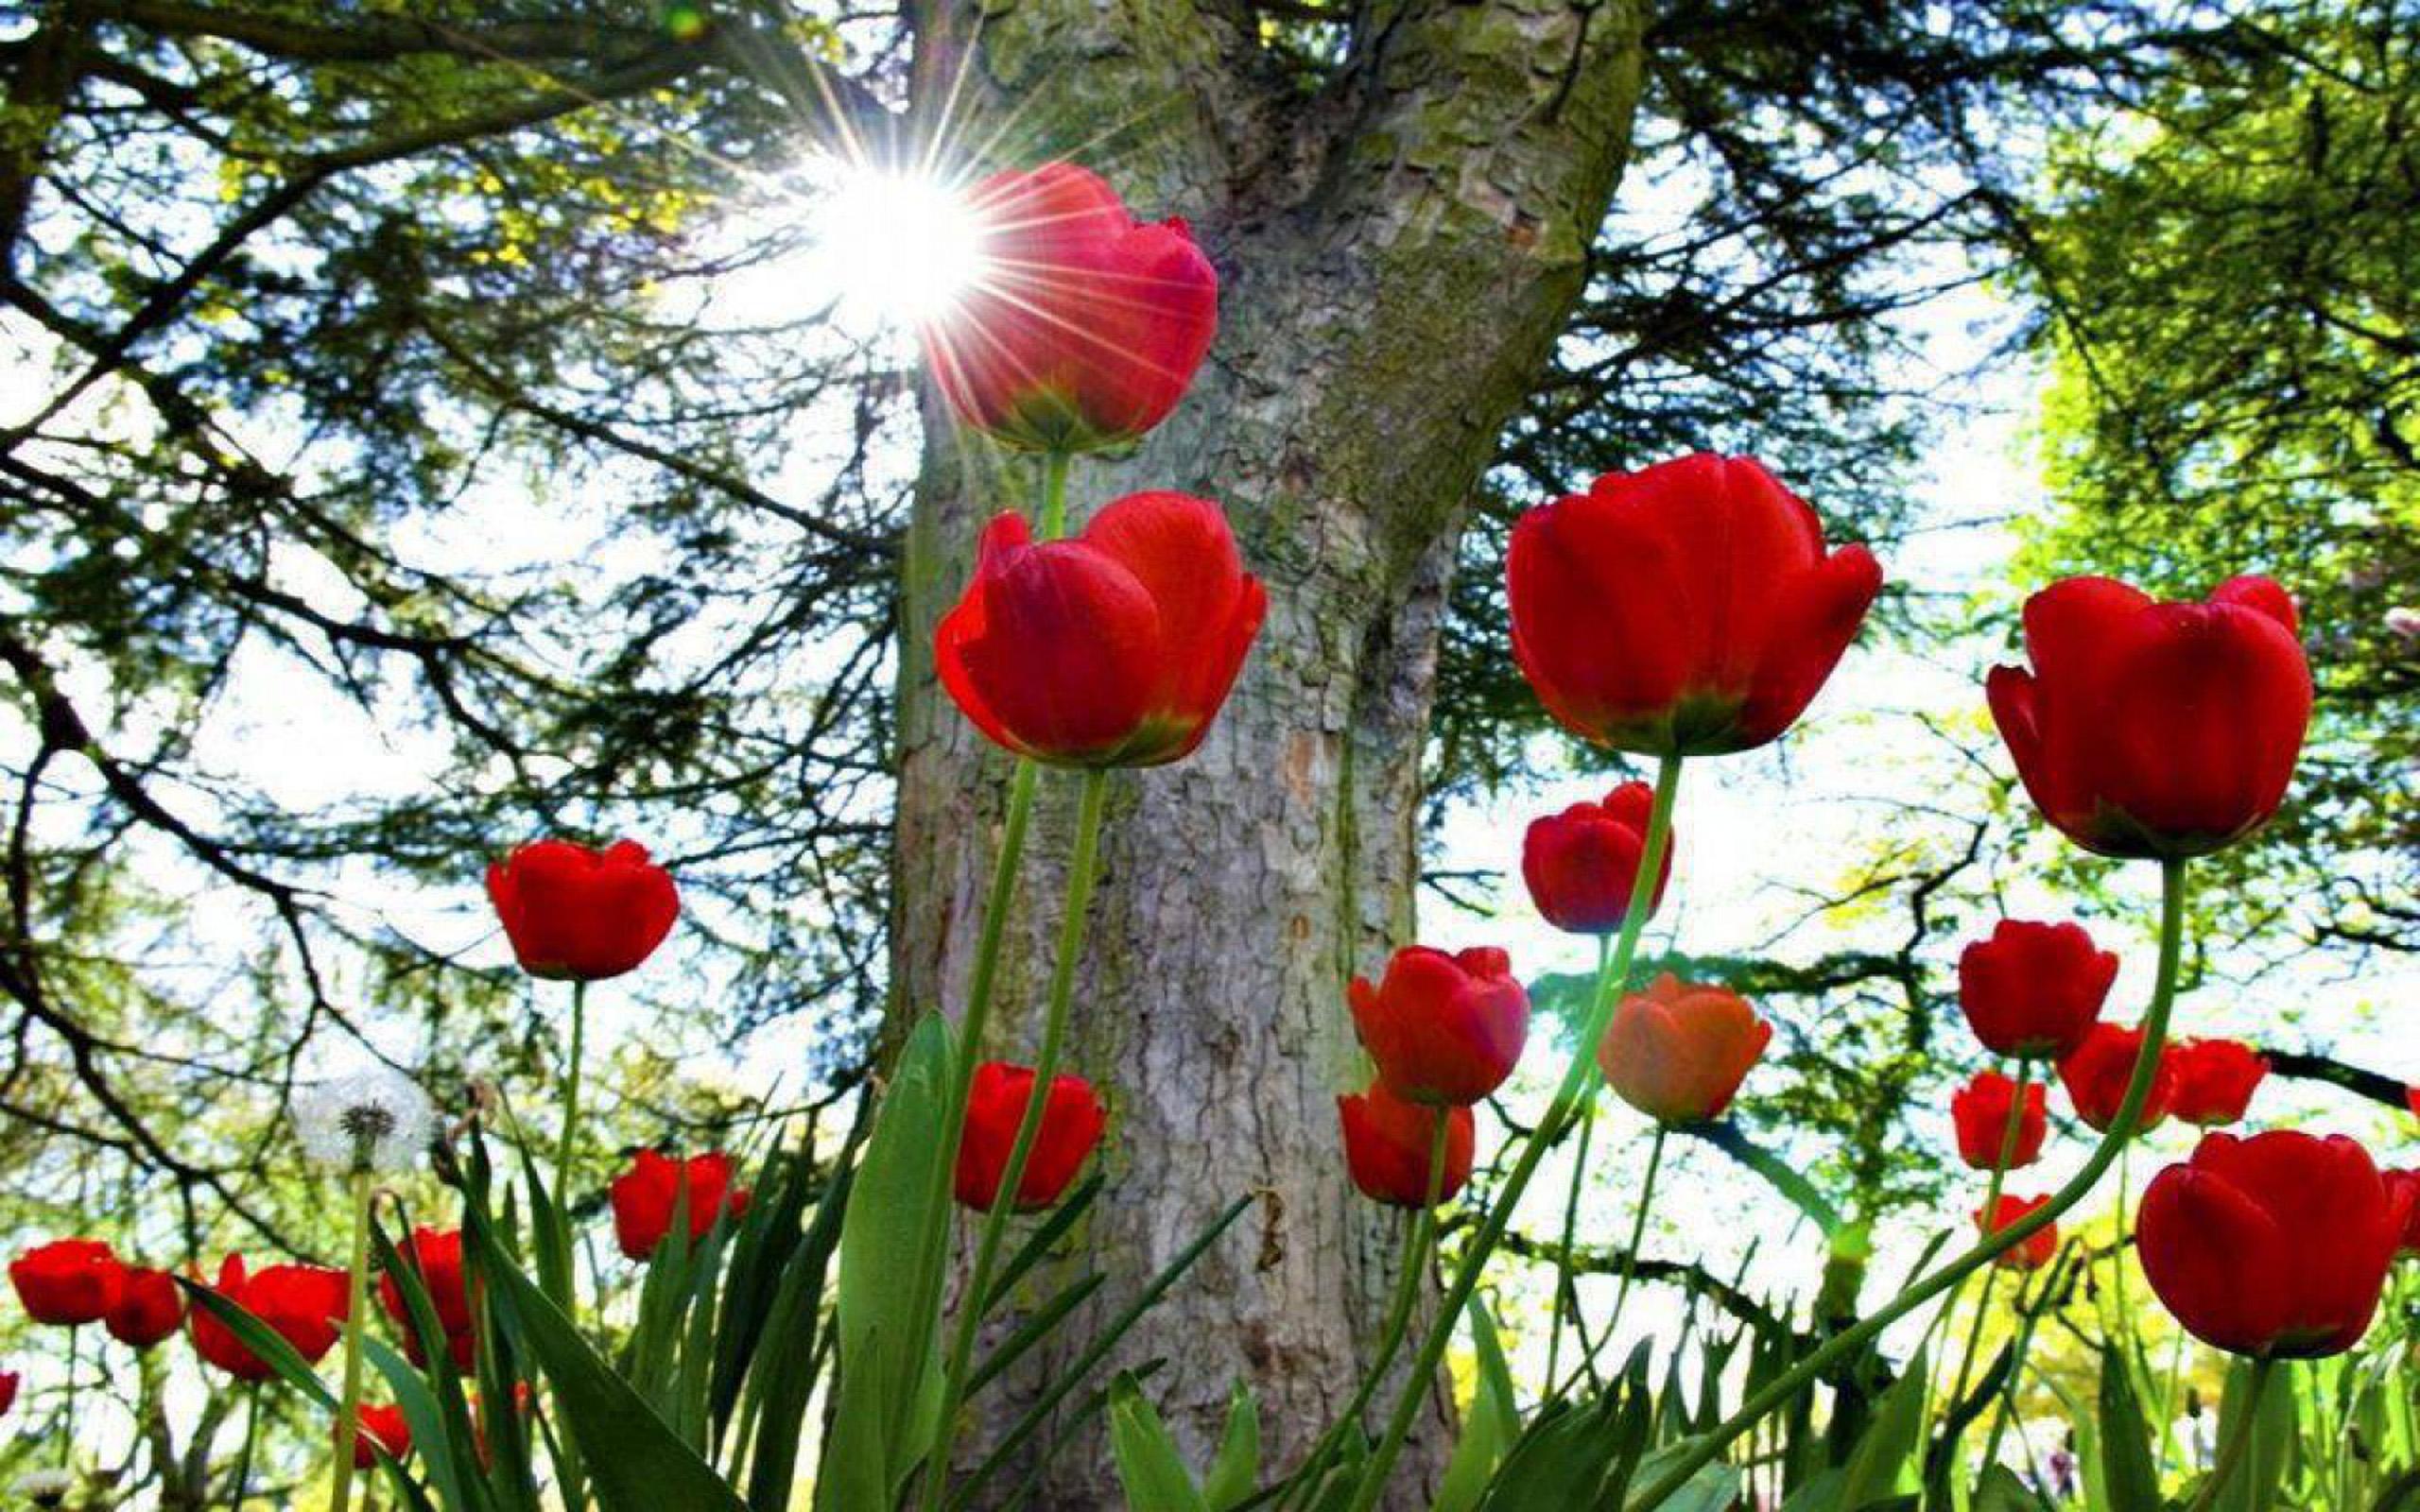 Beautiful Picture Desktop Background Widescreen Red - Desktop Background Flower Wallpaper Hd , HD Wallpaper & Backgrounds